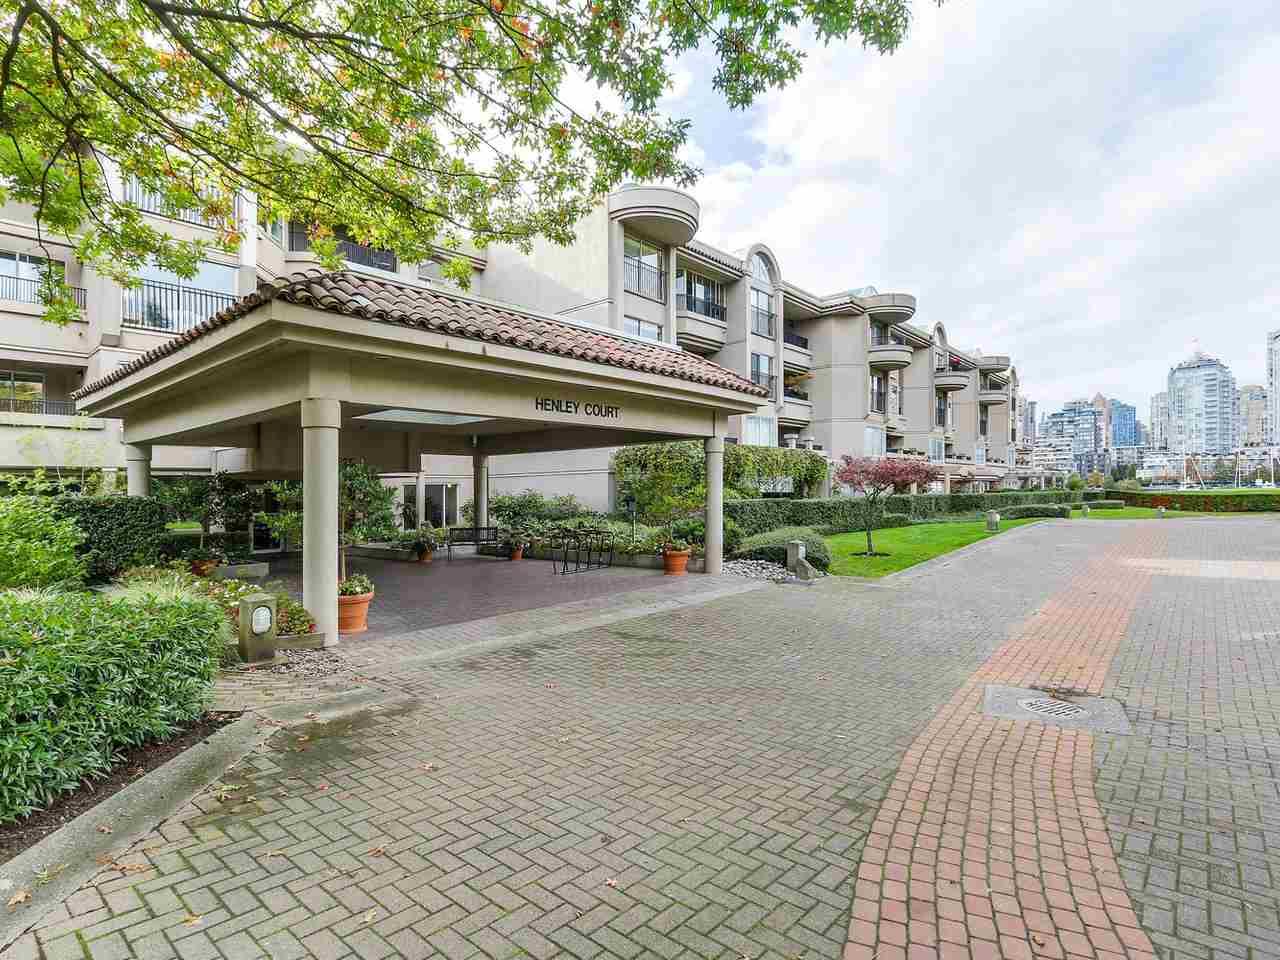 309 525 WHEELHOUSE SQUARE, Vancouver, BC, V5Z 4L8 Primary Photo